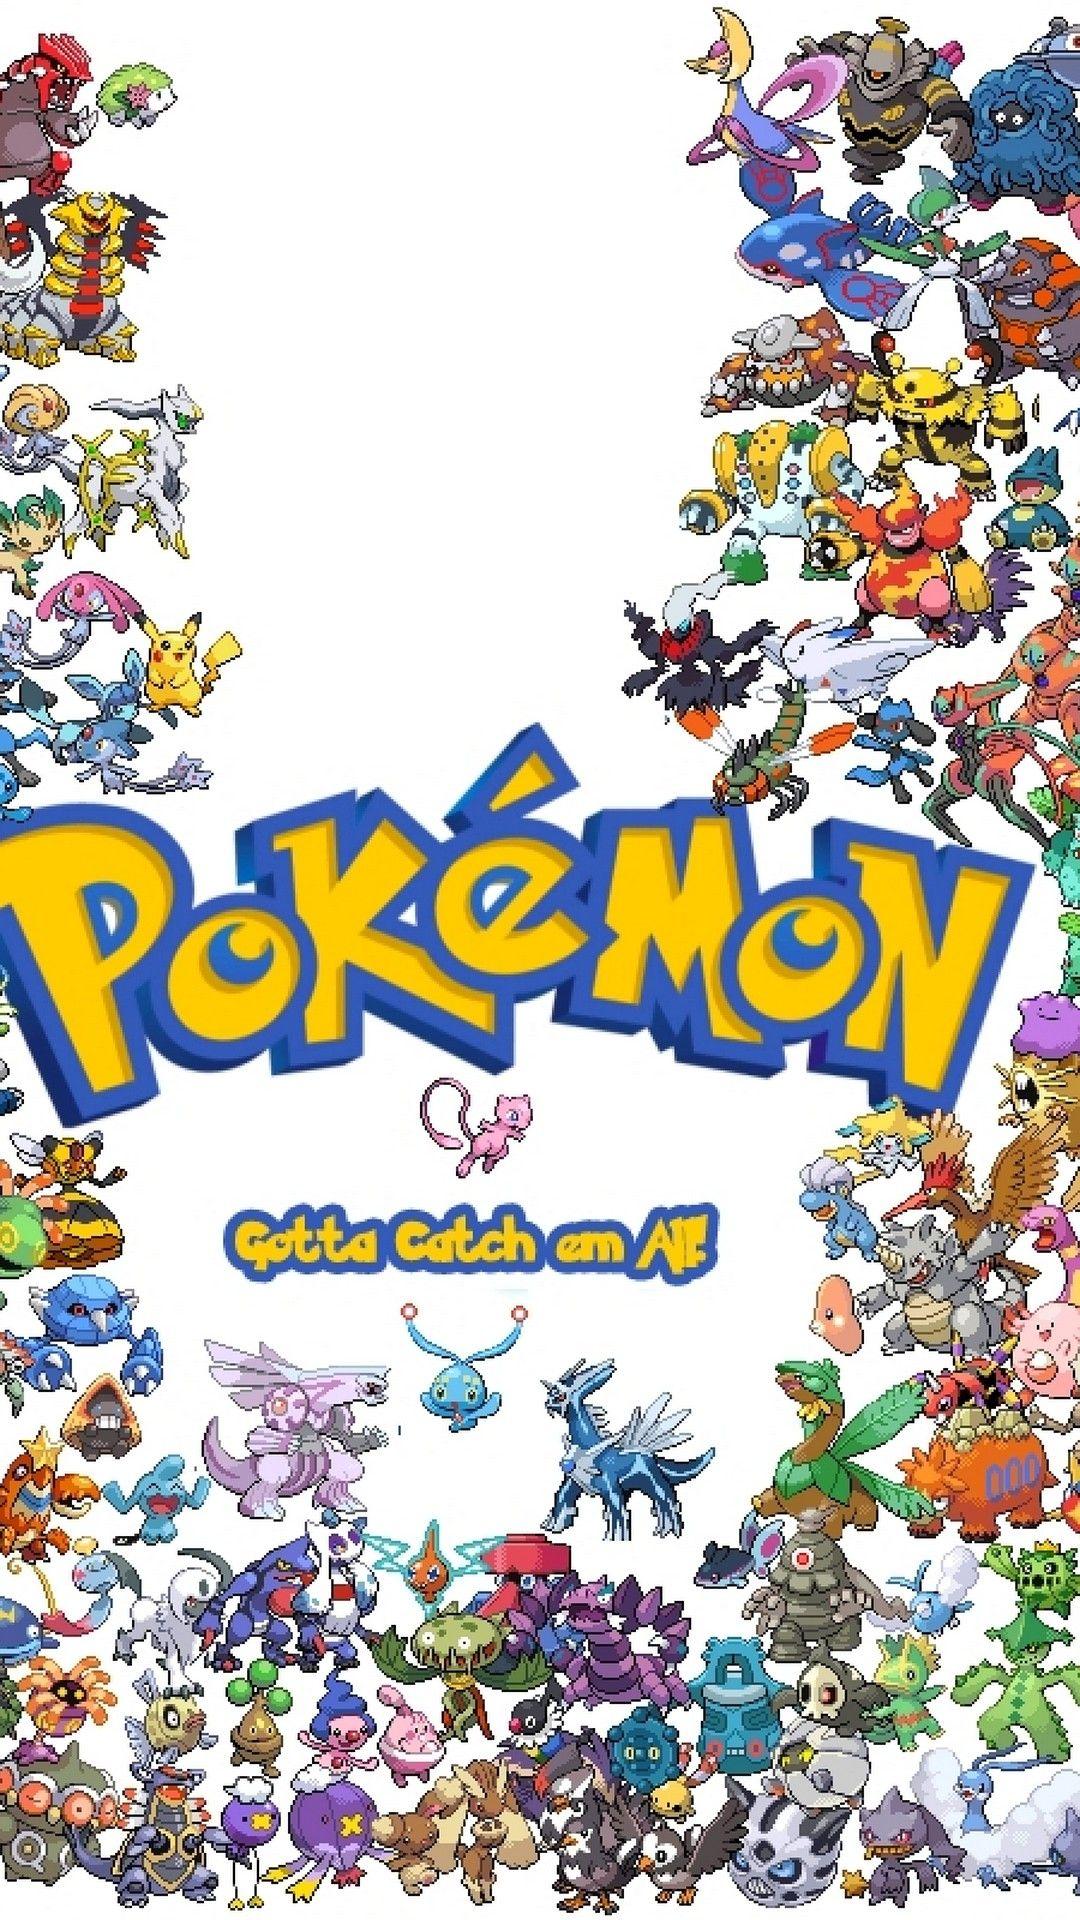 Pokemon Cool samsung wallpaper